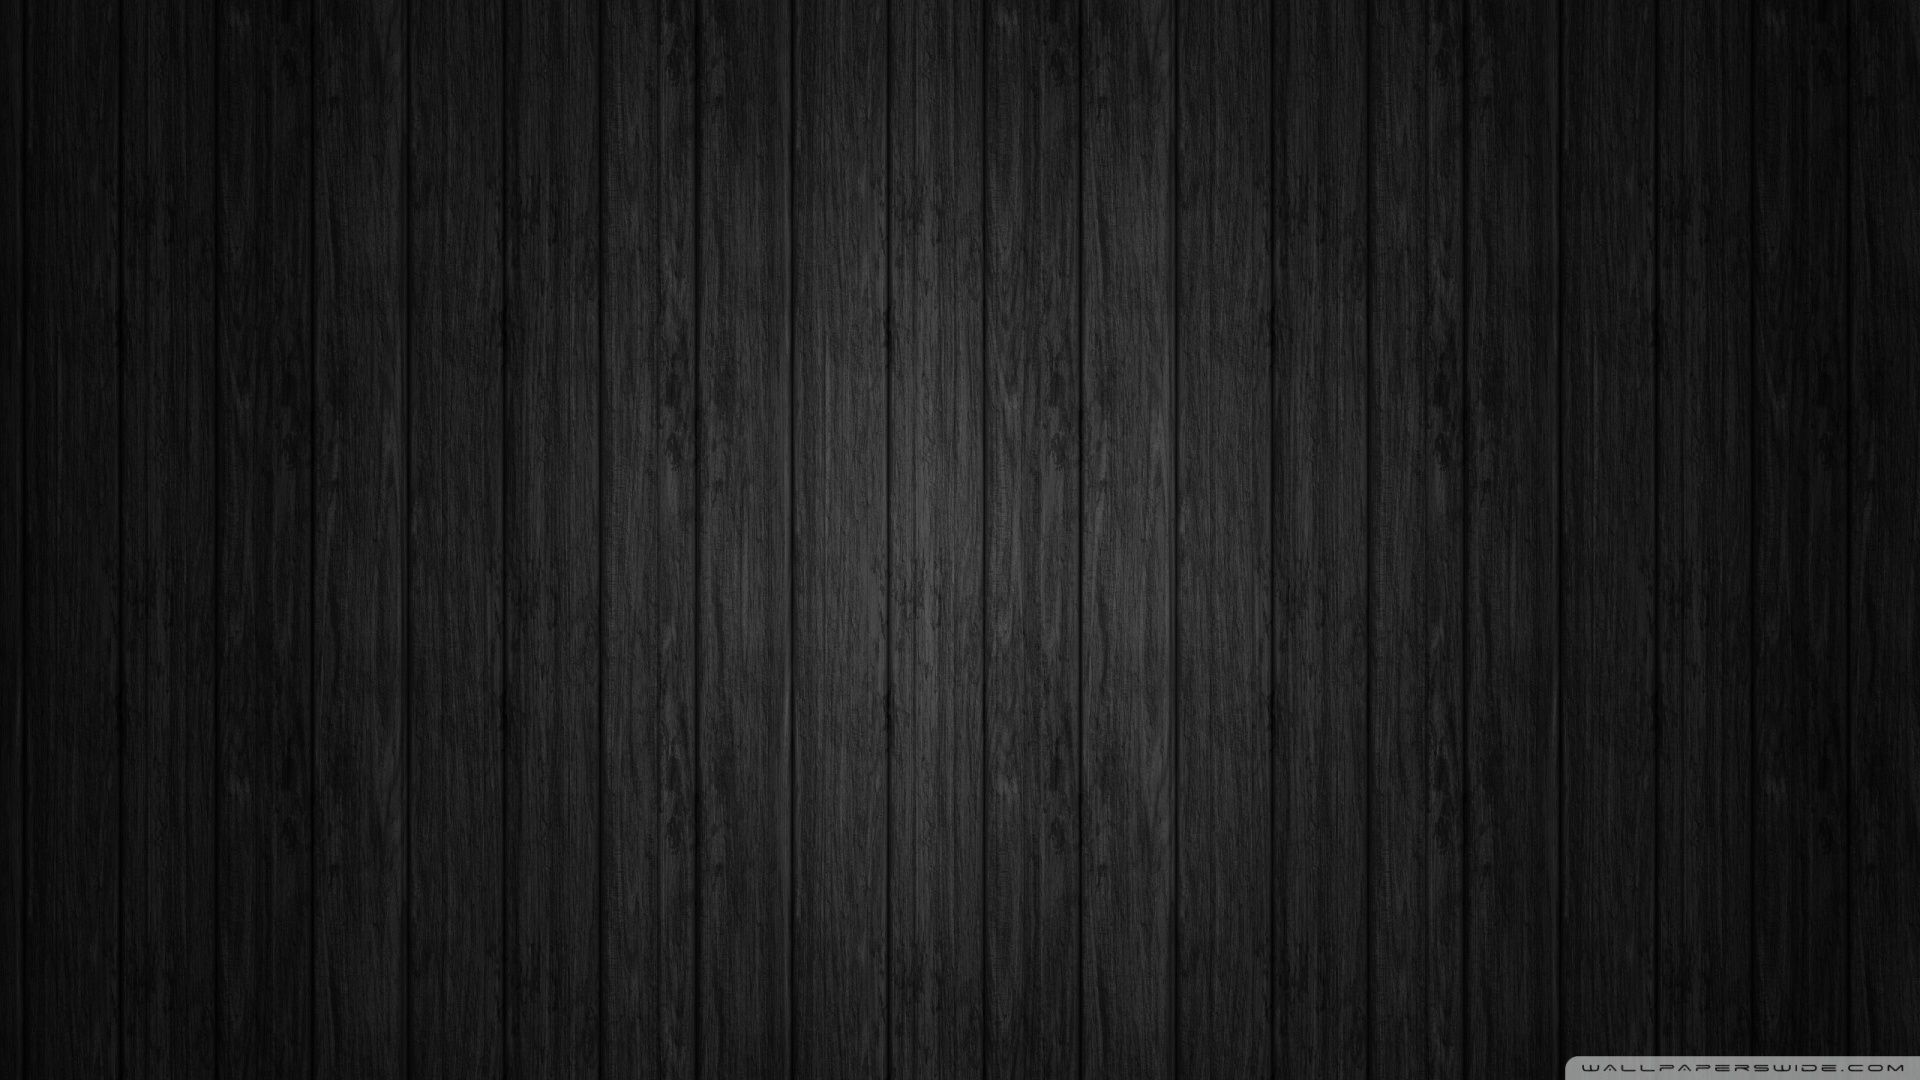 79 1080p Black Wallpapers On Wallpaperplay Black Hd Wallpaper Black Background Wallpaper Black Wallpaper